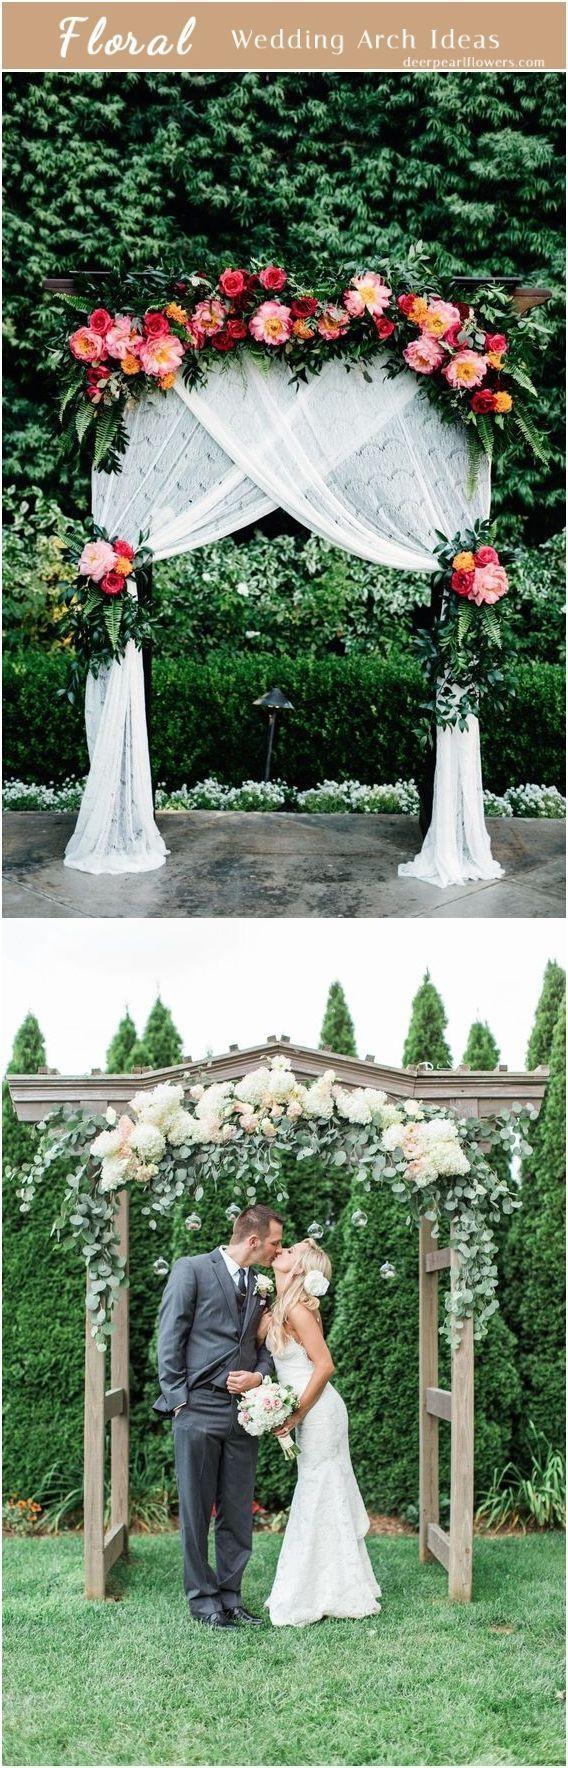 best wedding ideas boda images on pinterest wedding parties